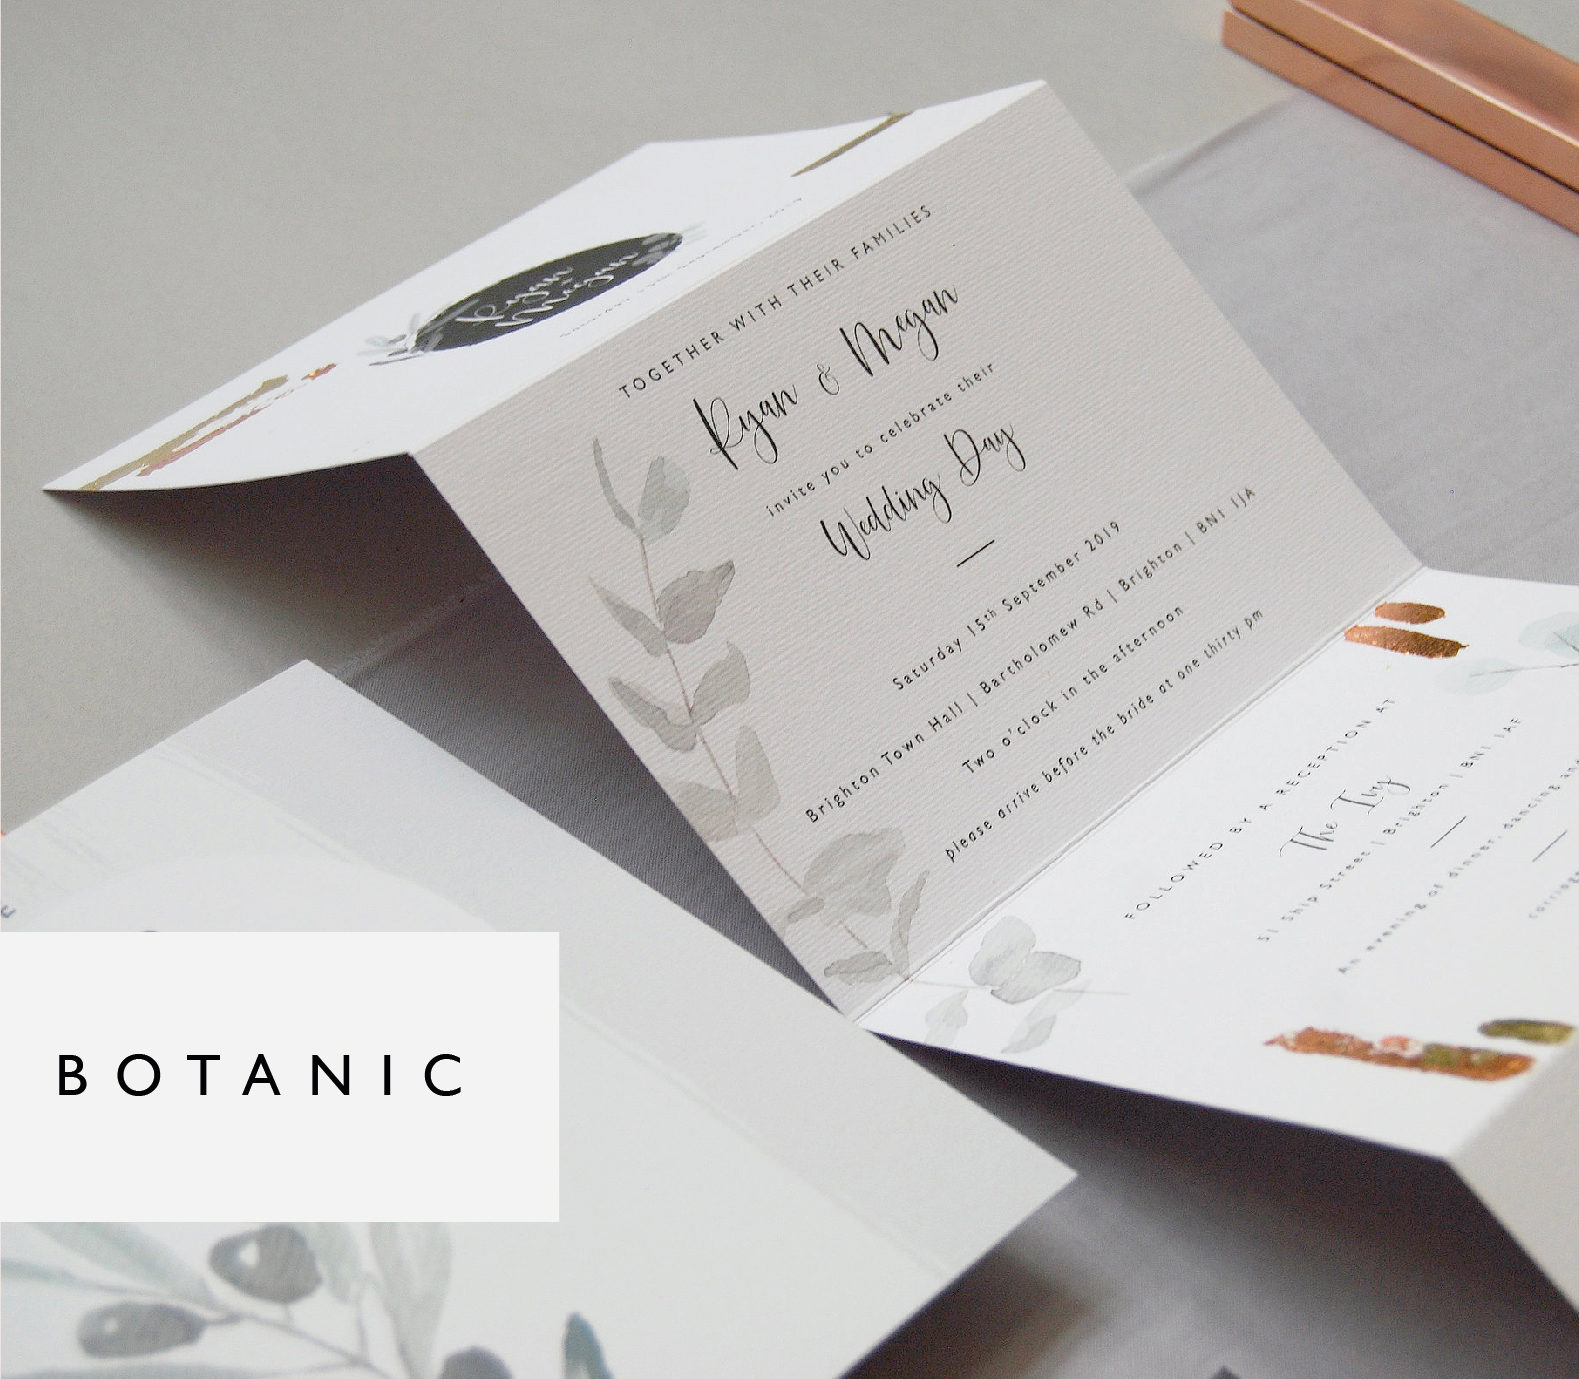 Botanic-template-01.jpg